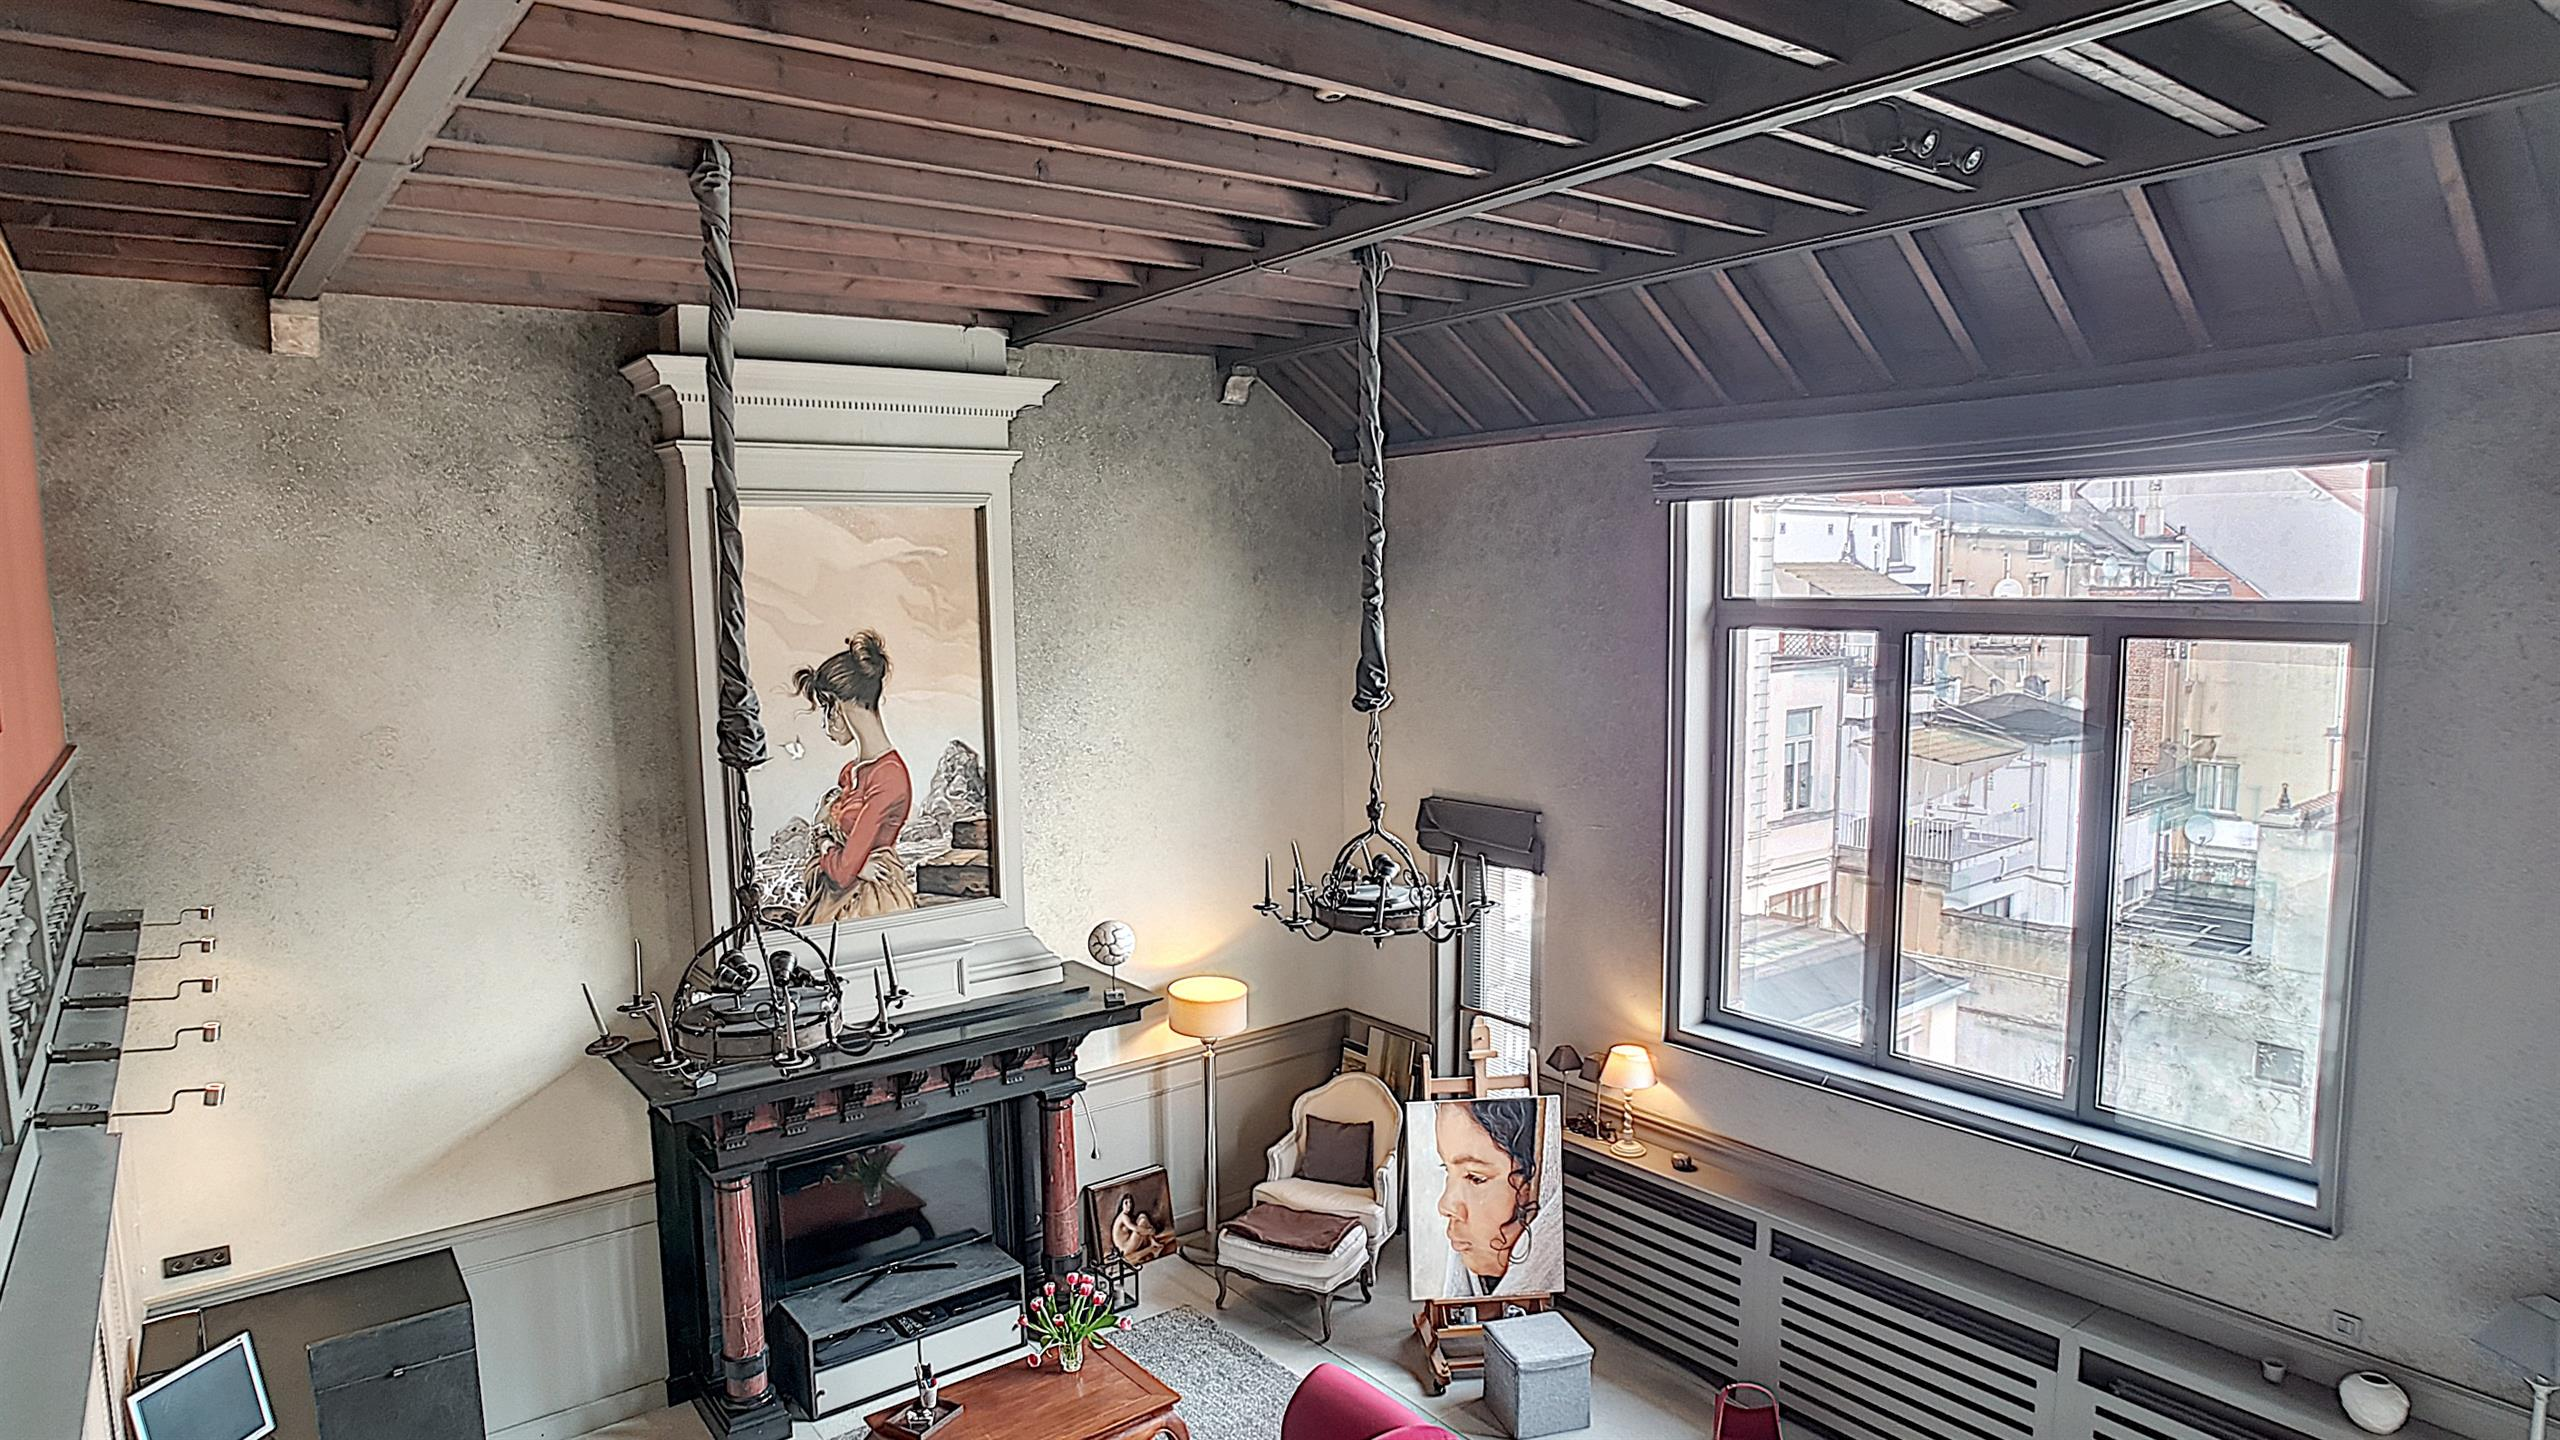 Maison de maitre - Schaerbeek - #4318566-30